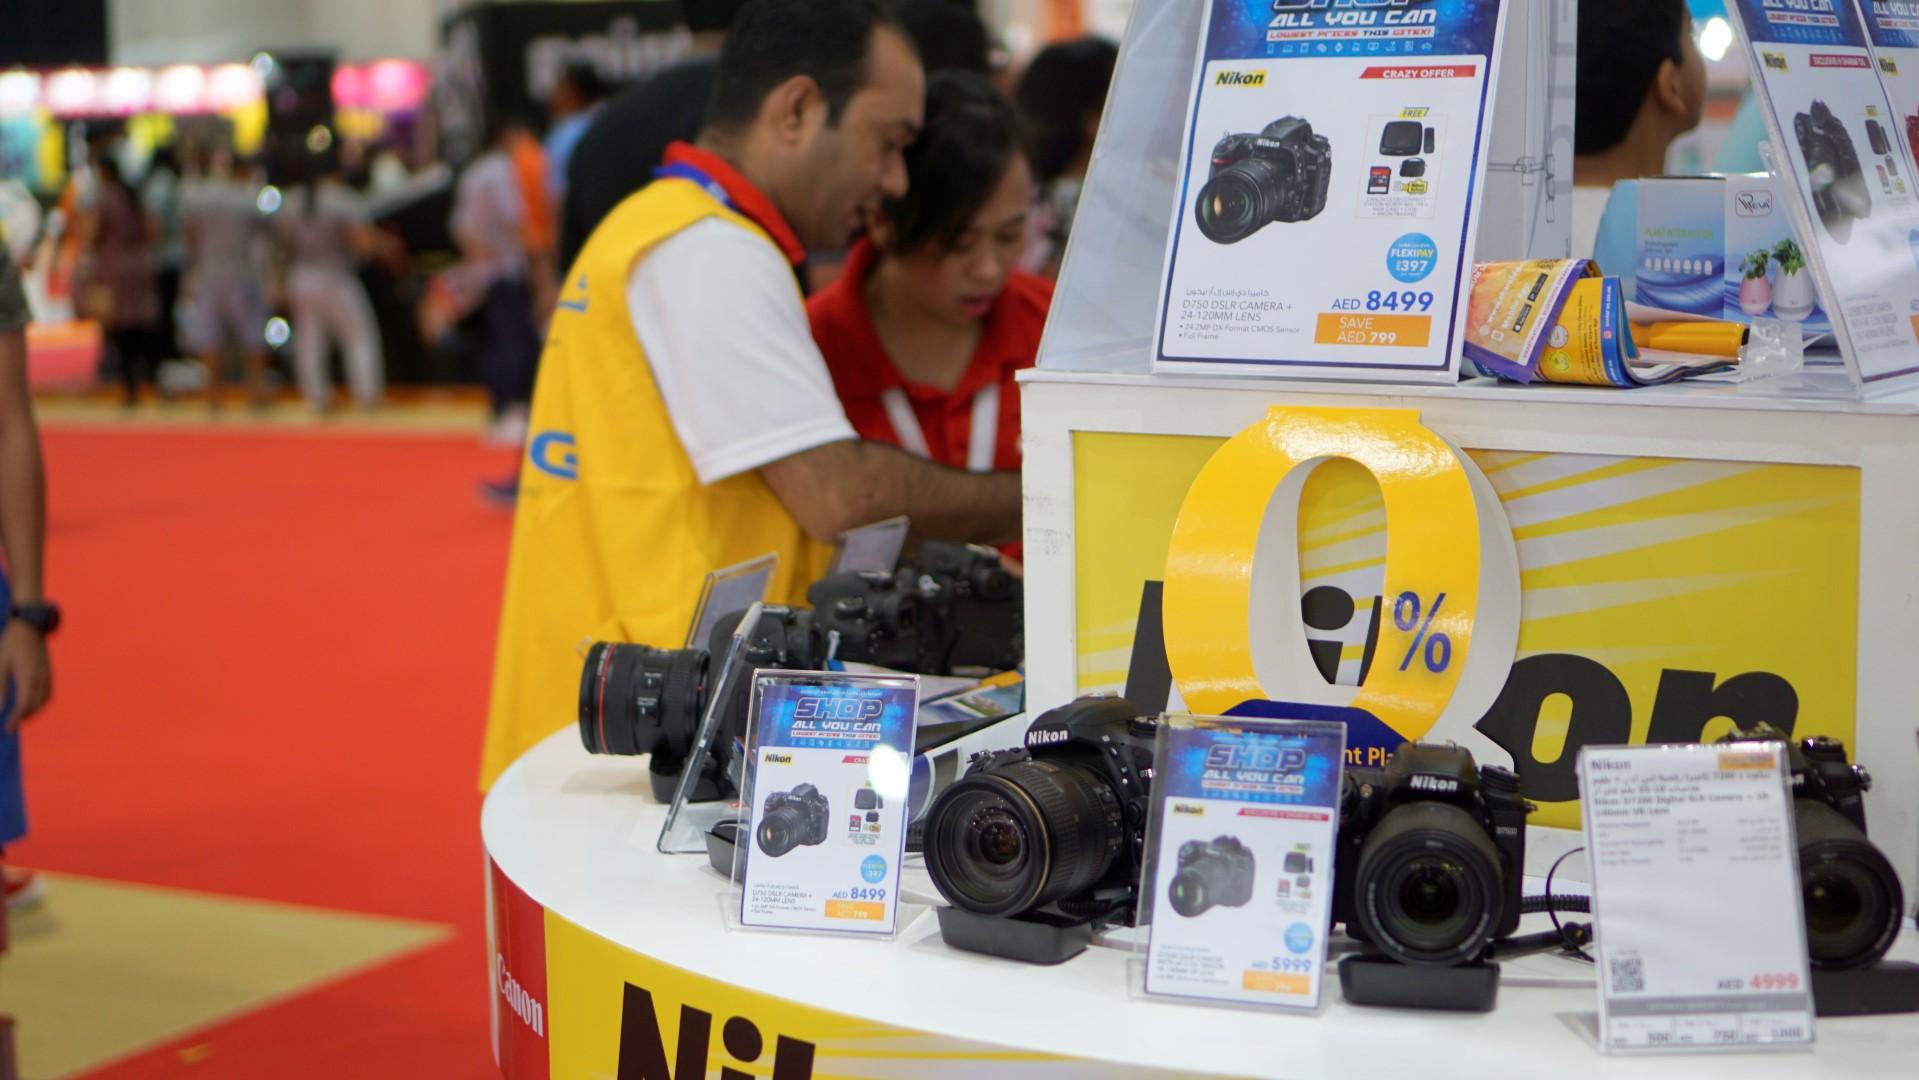 Best camera deals and offers at GITEX Shopper 2017